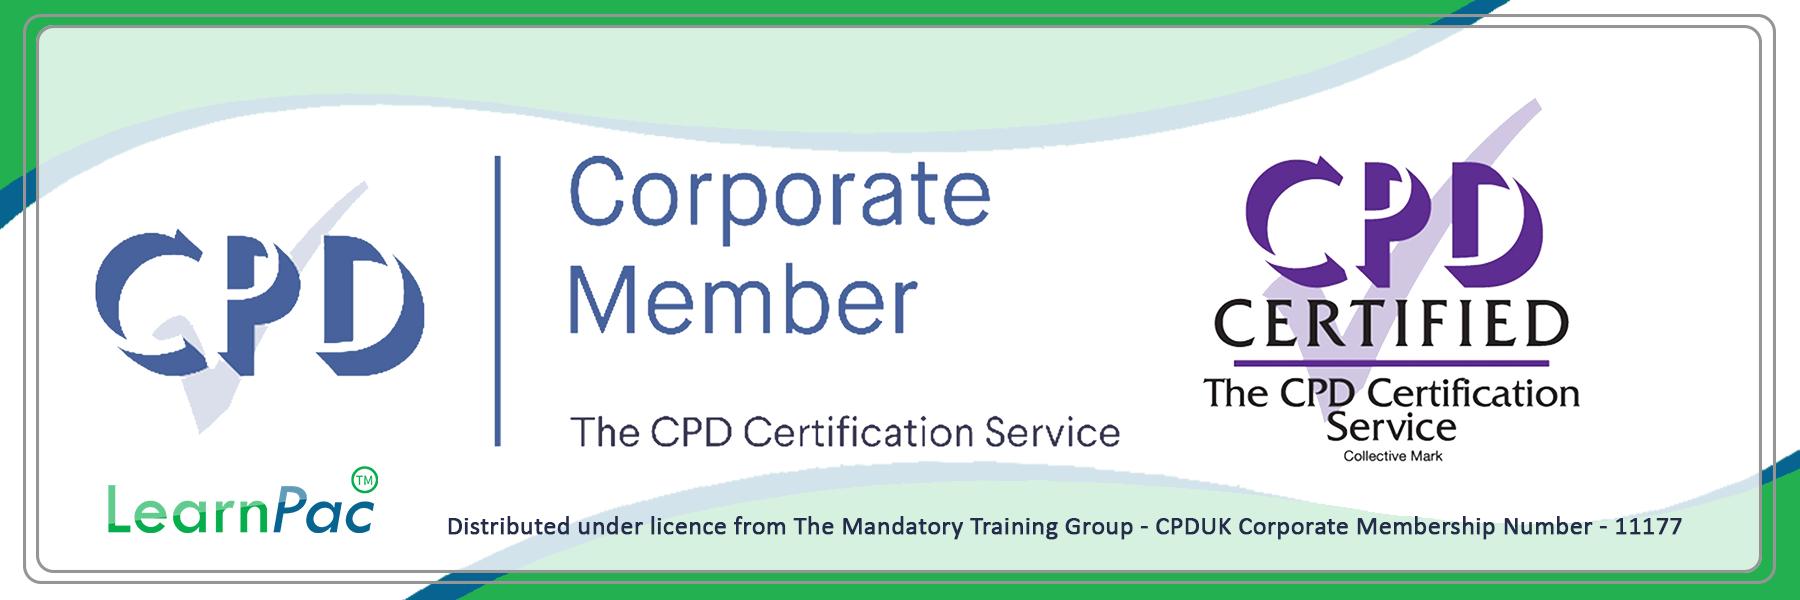 Care Certificate Standard 13 - CPDUK Certified - Learnpac System UK -